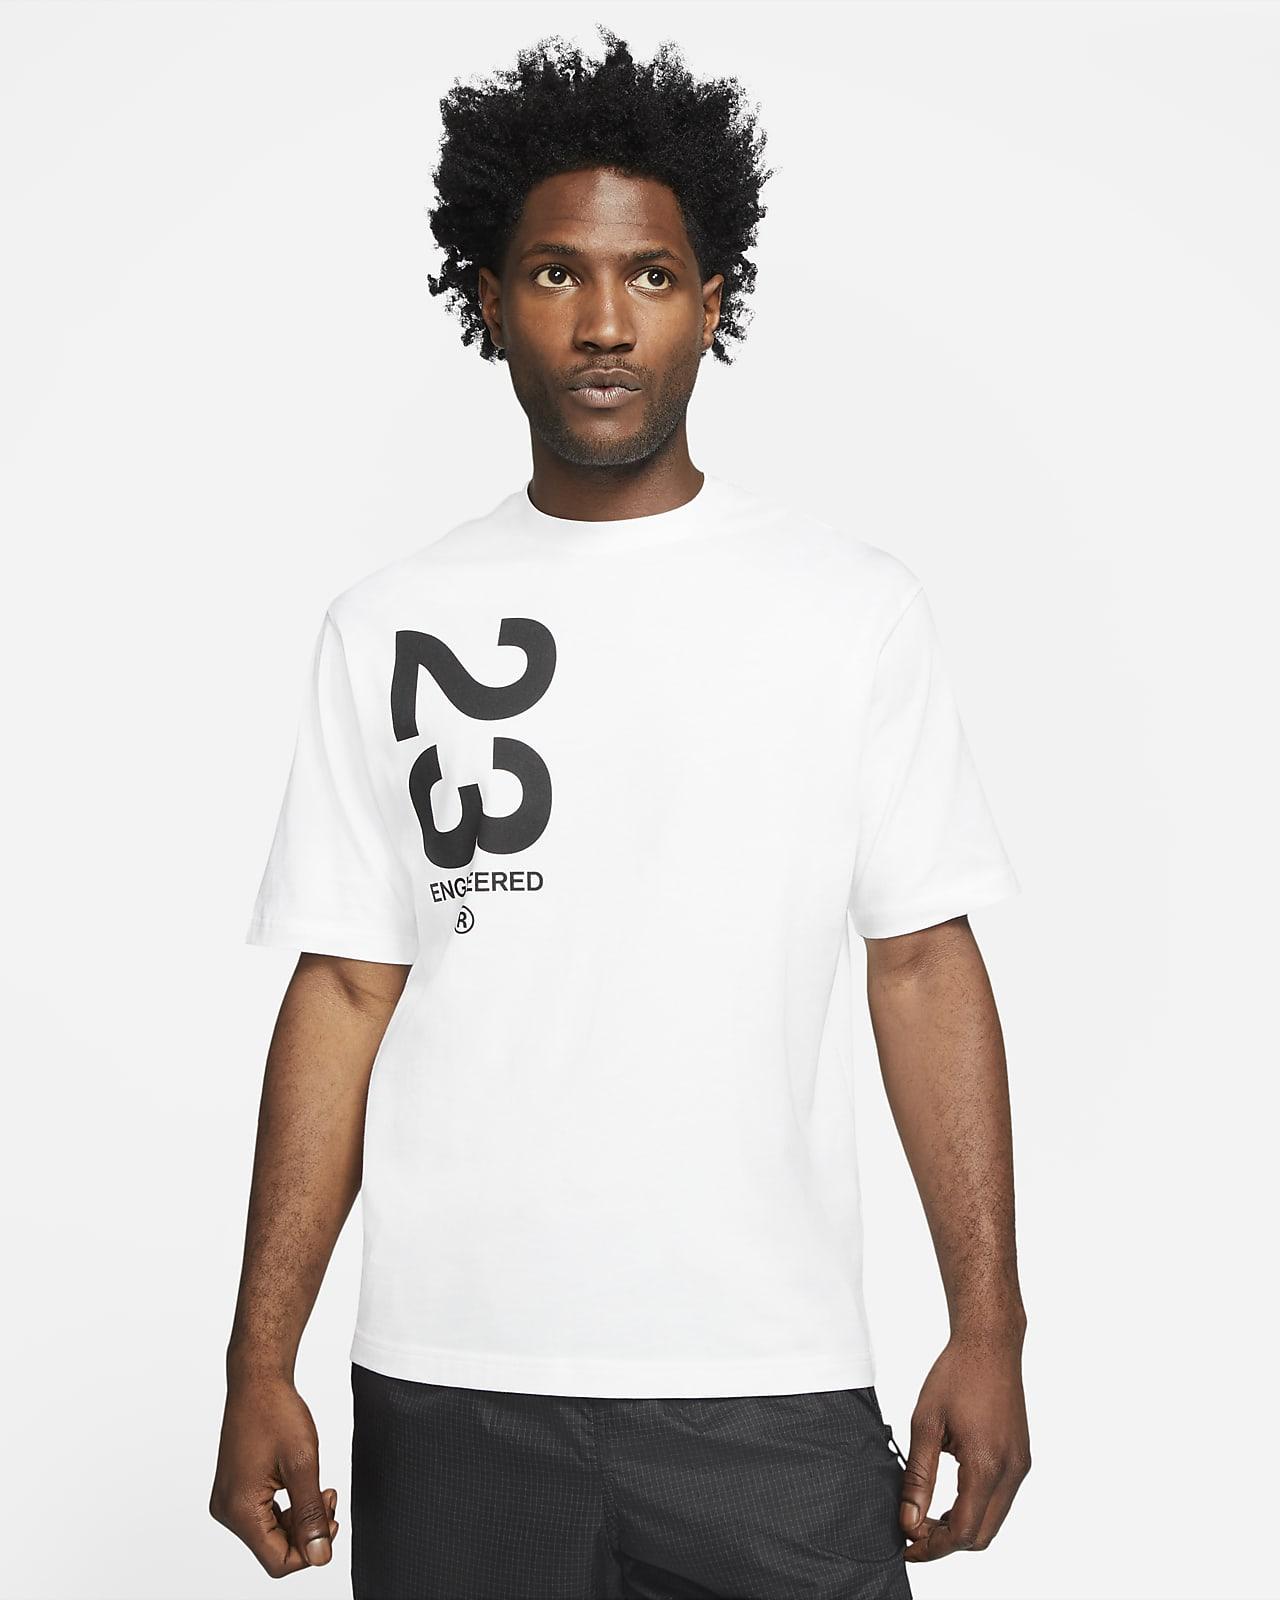 Tee-shirt à manches courtes Jordan 23 Engineered pour Homme